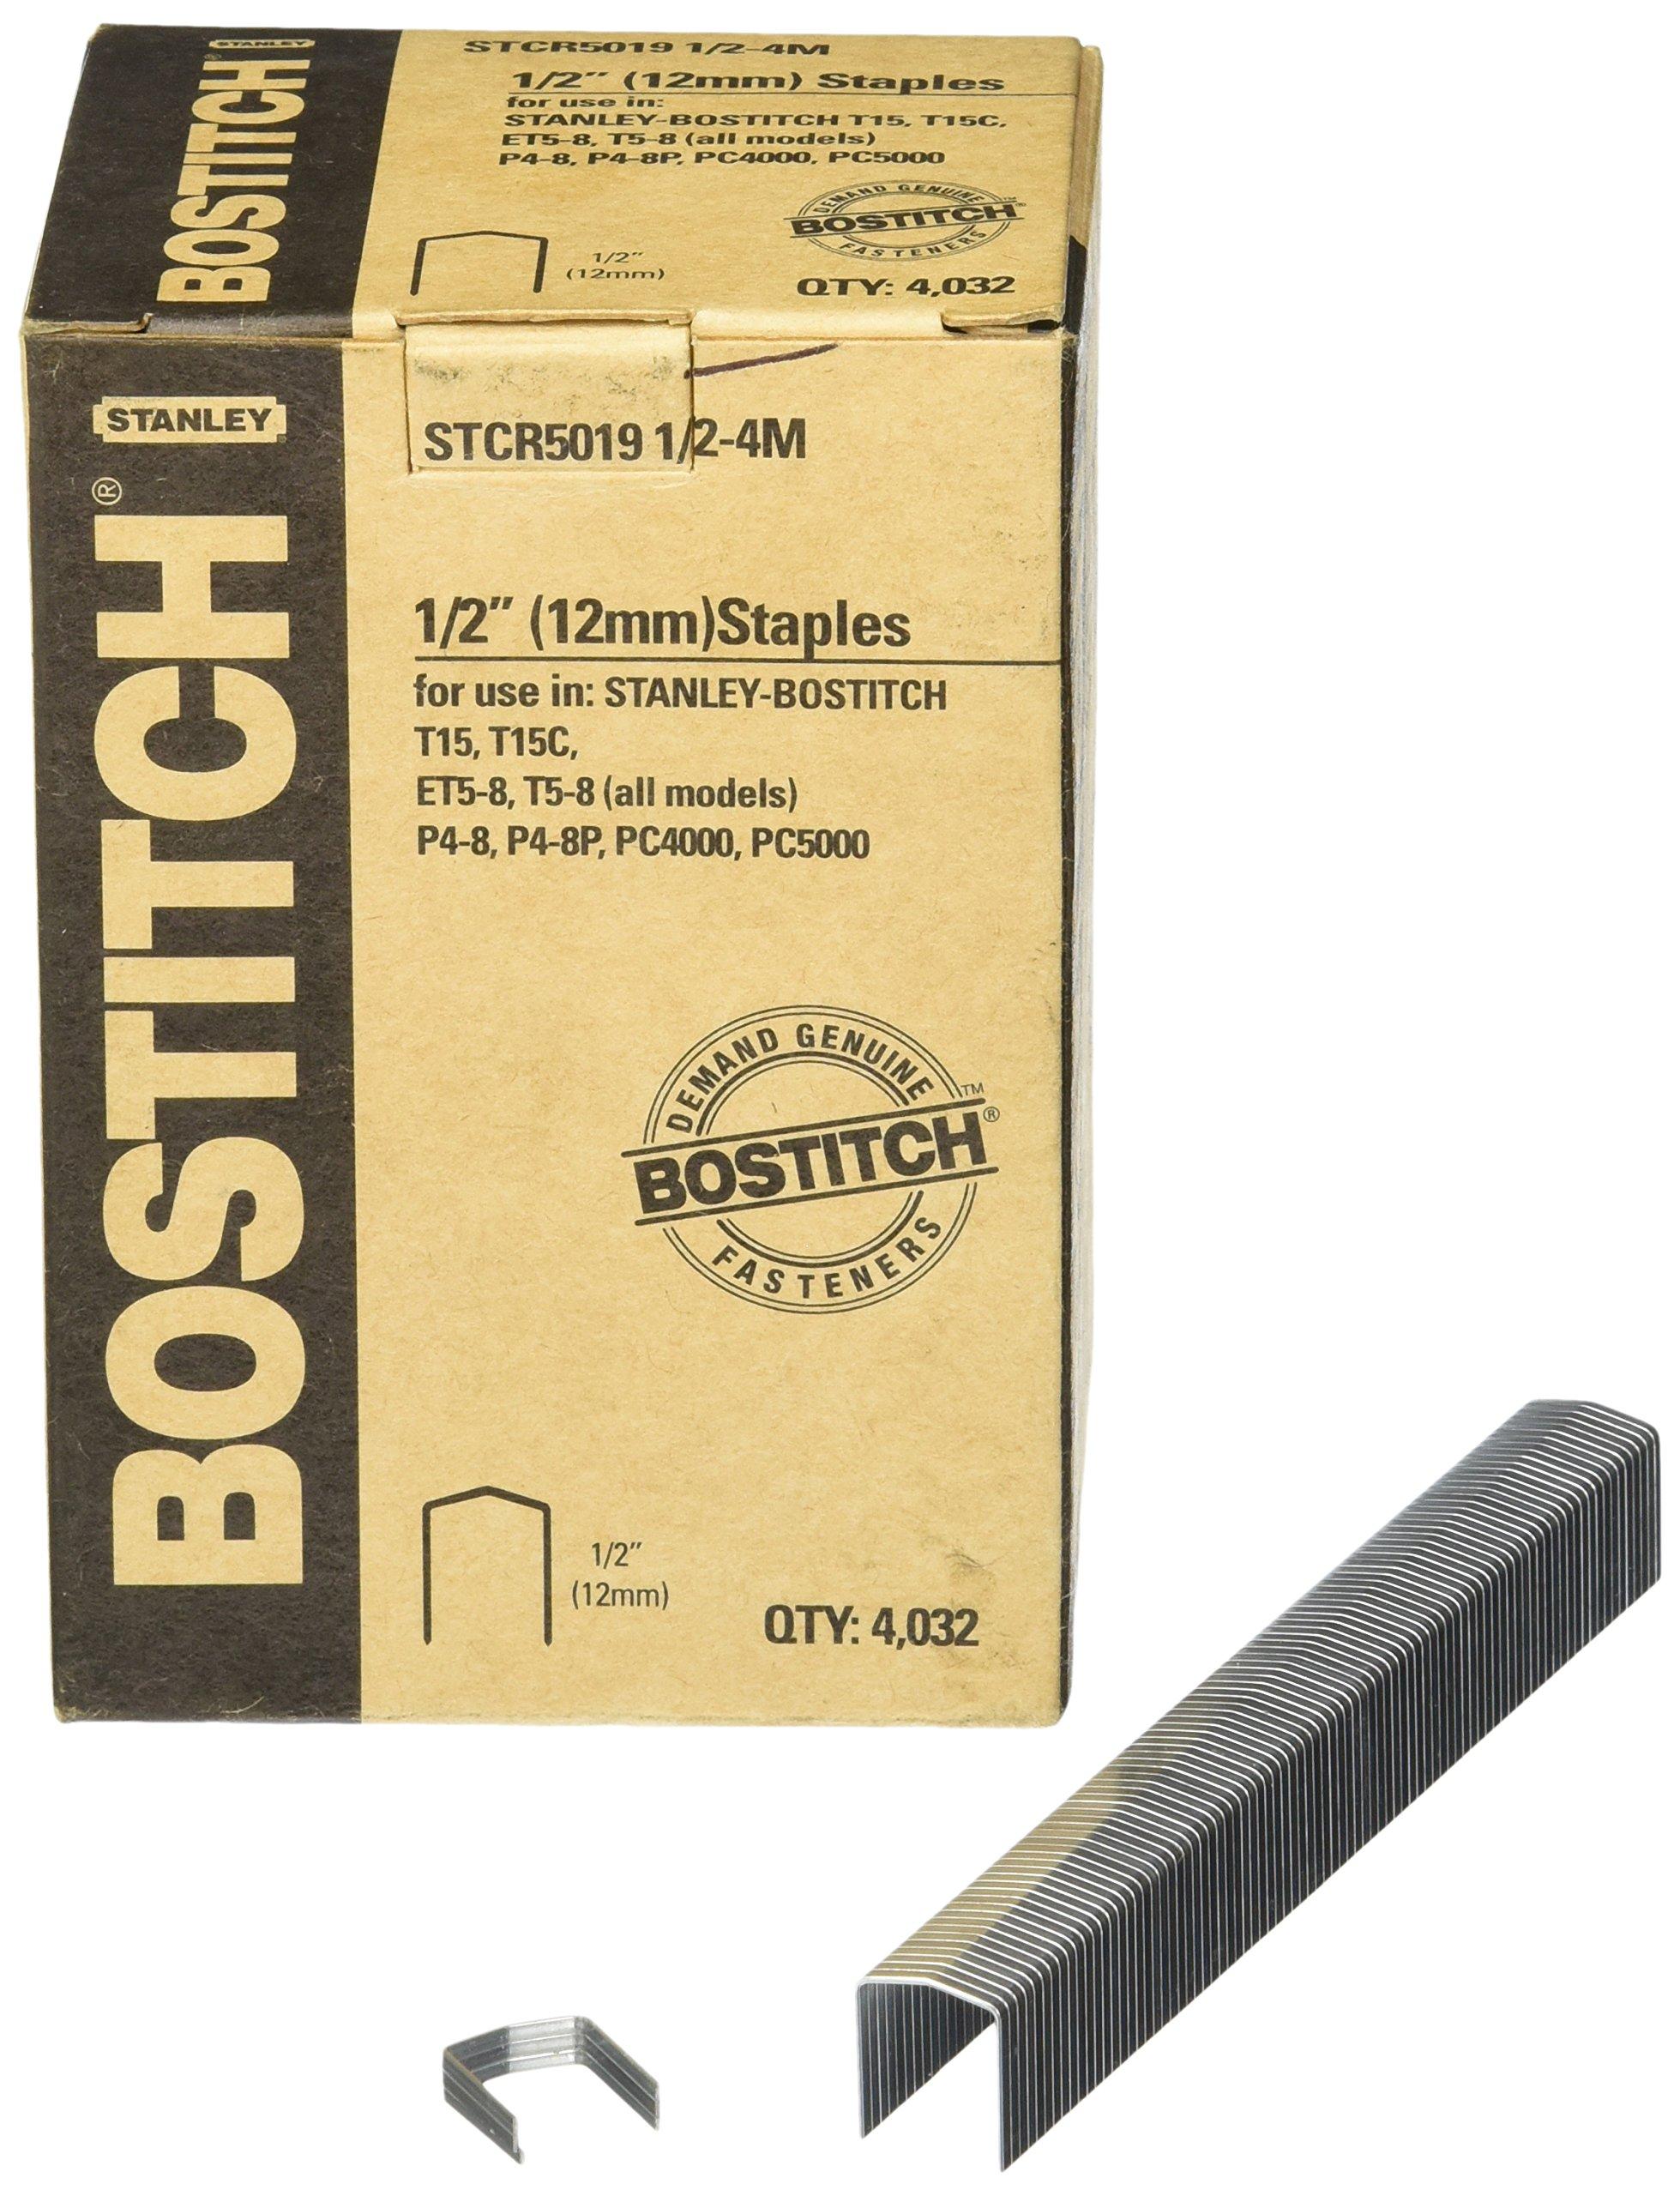 Bostitch STCR50191/2-4M 1/2-Inch by 7/16-Inch Heavy-Duty PowerCrown Staple (4,032 per Box)